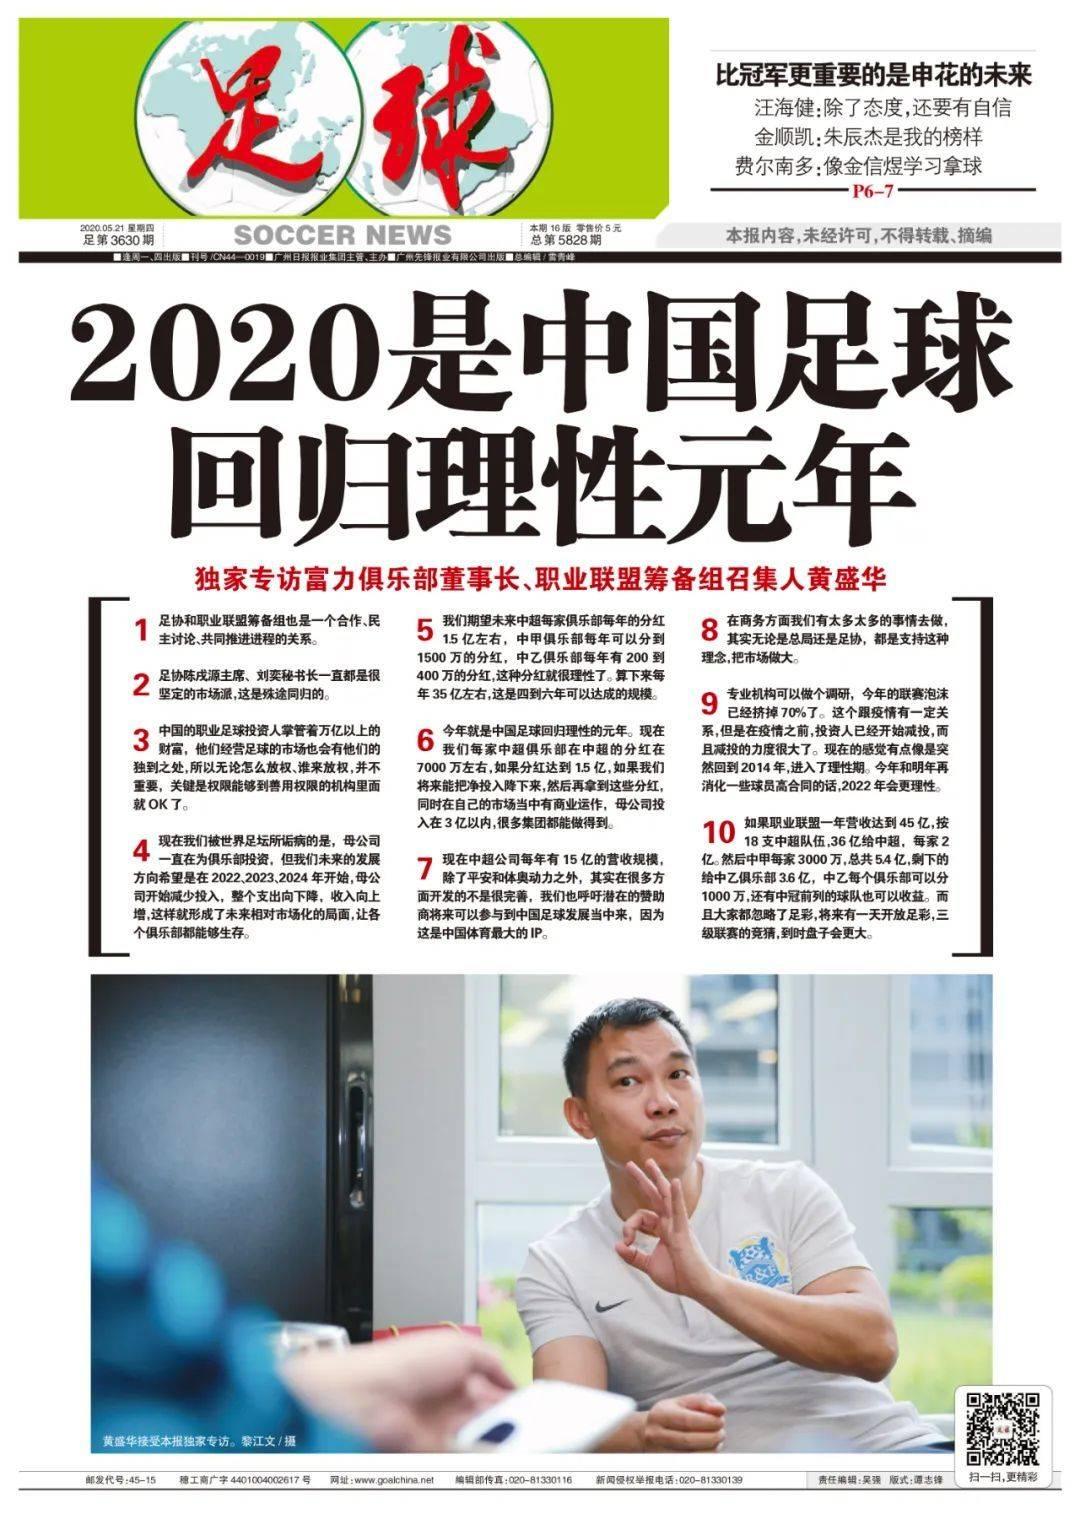 <strong>富力董事长:今年是中国足球回归理性元年 联赛泡</strong>